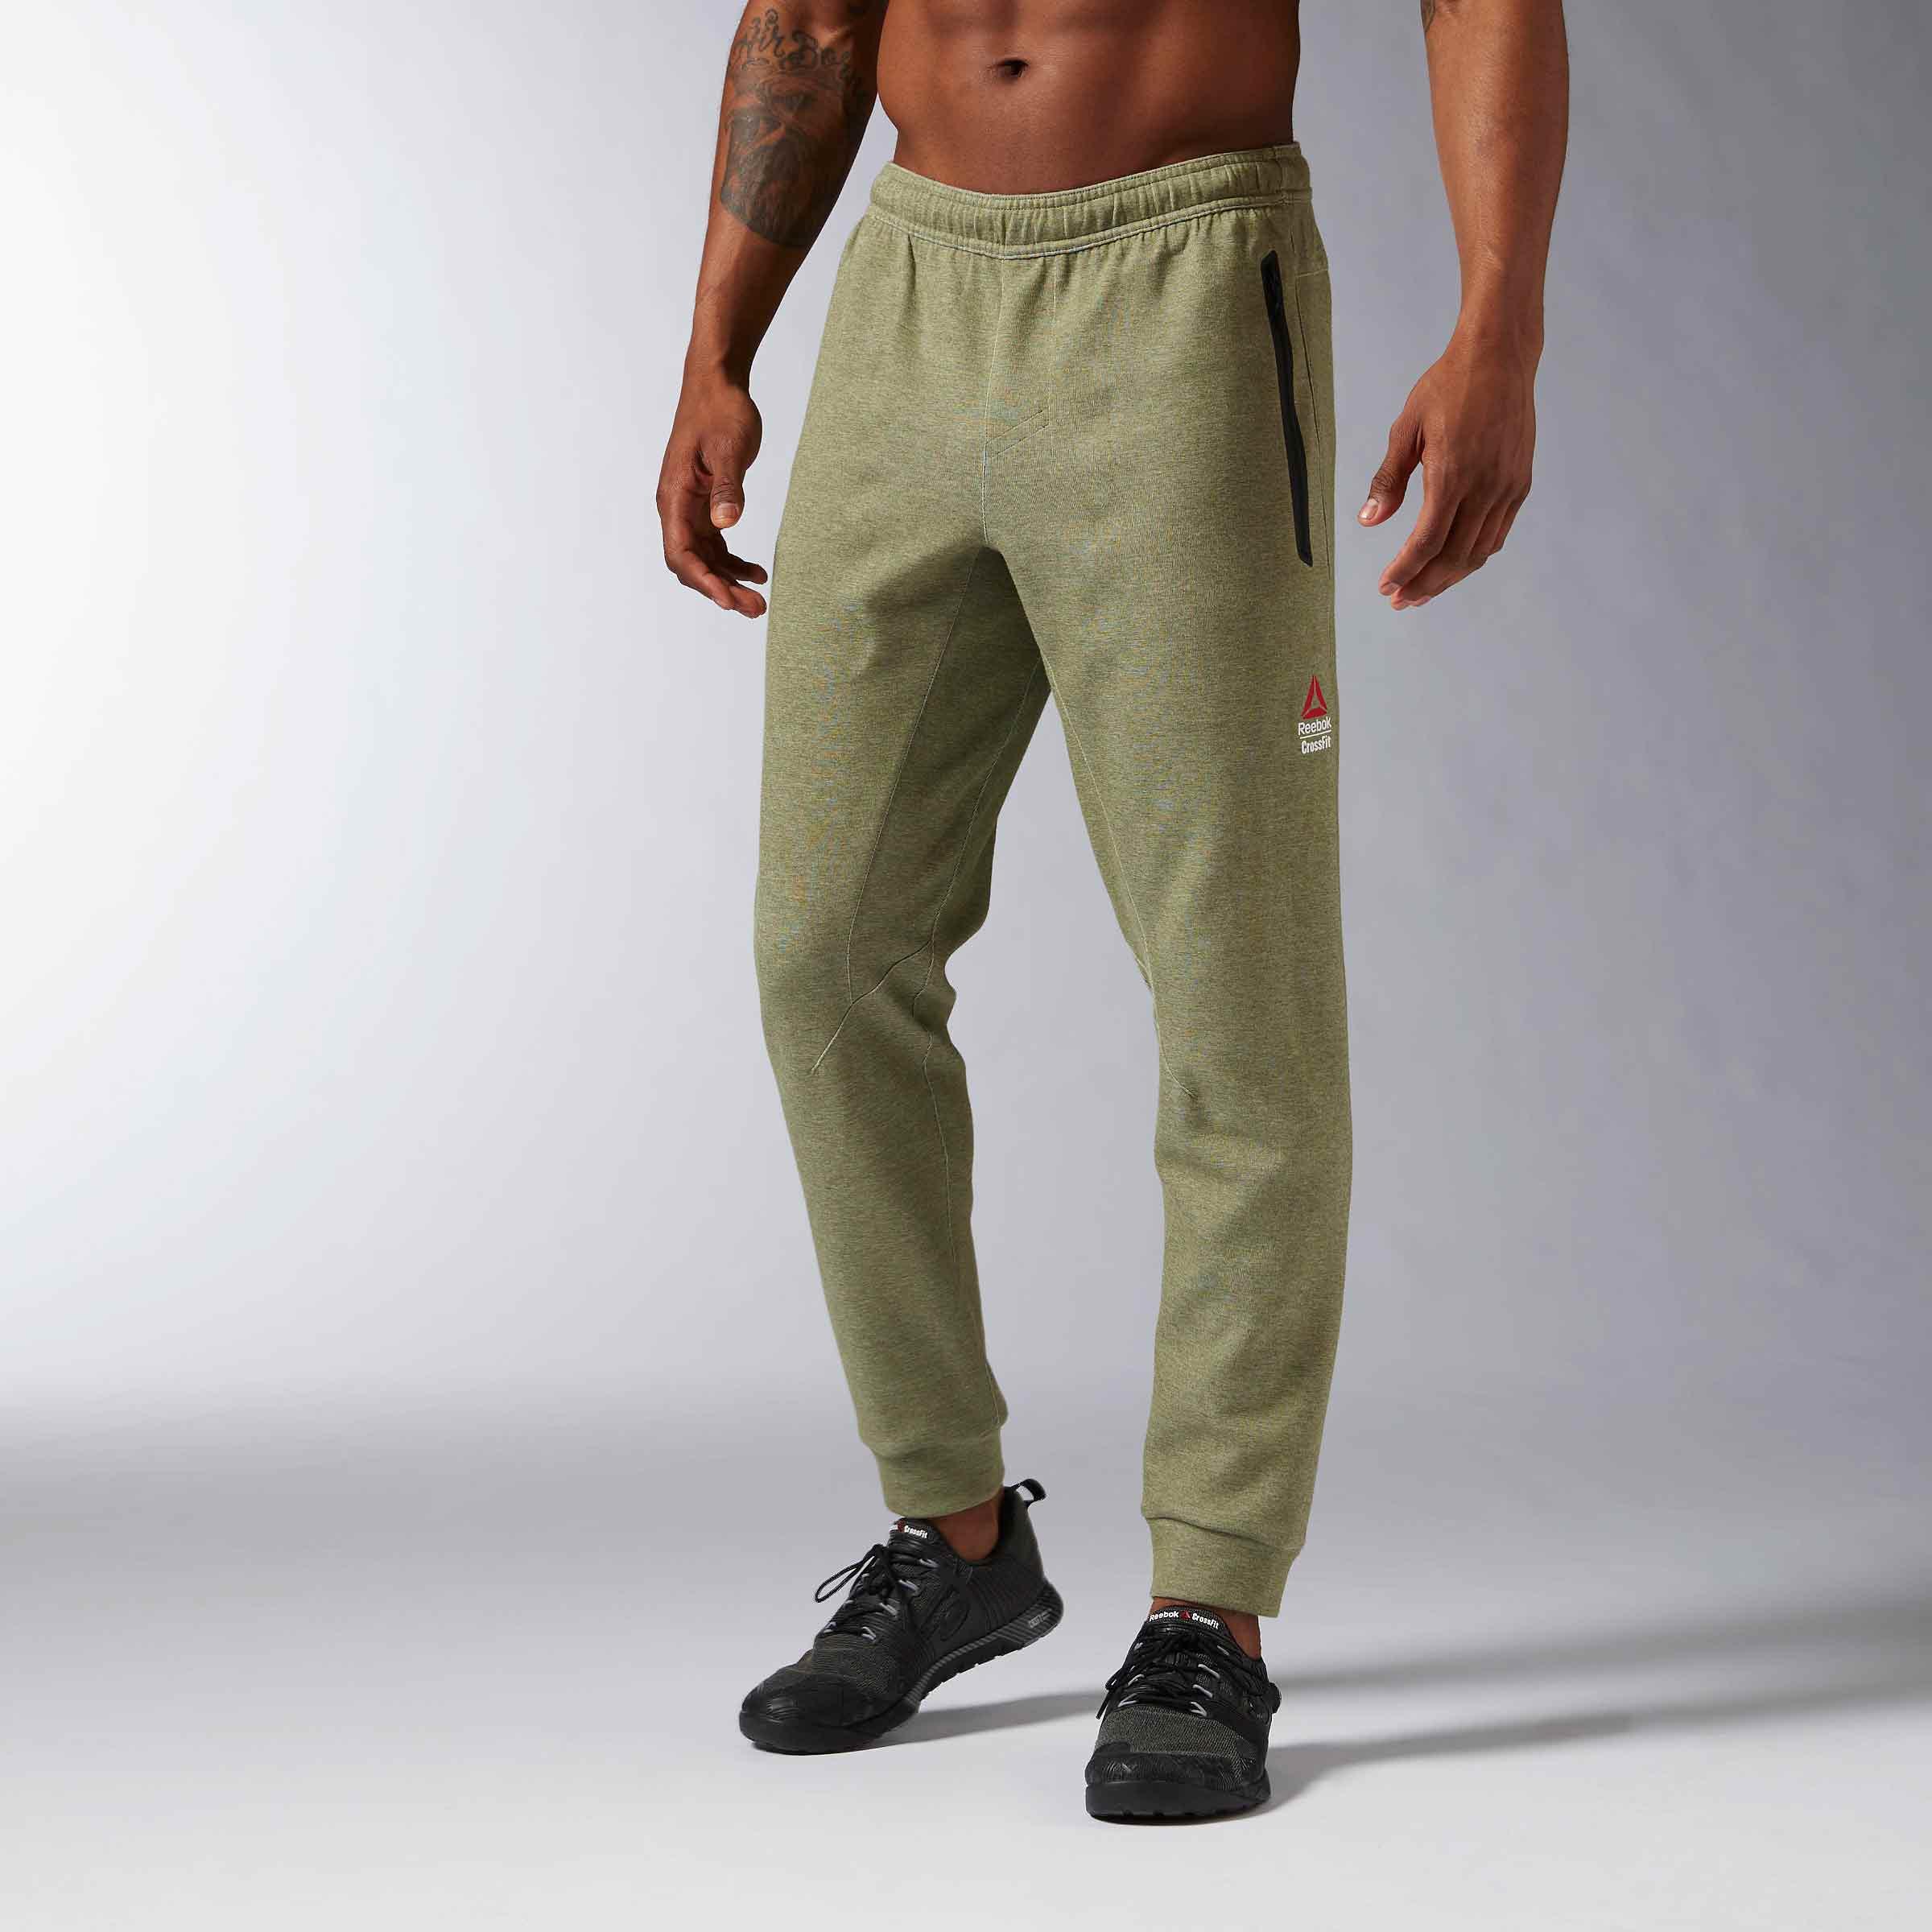 CrossFit Fleece Pant